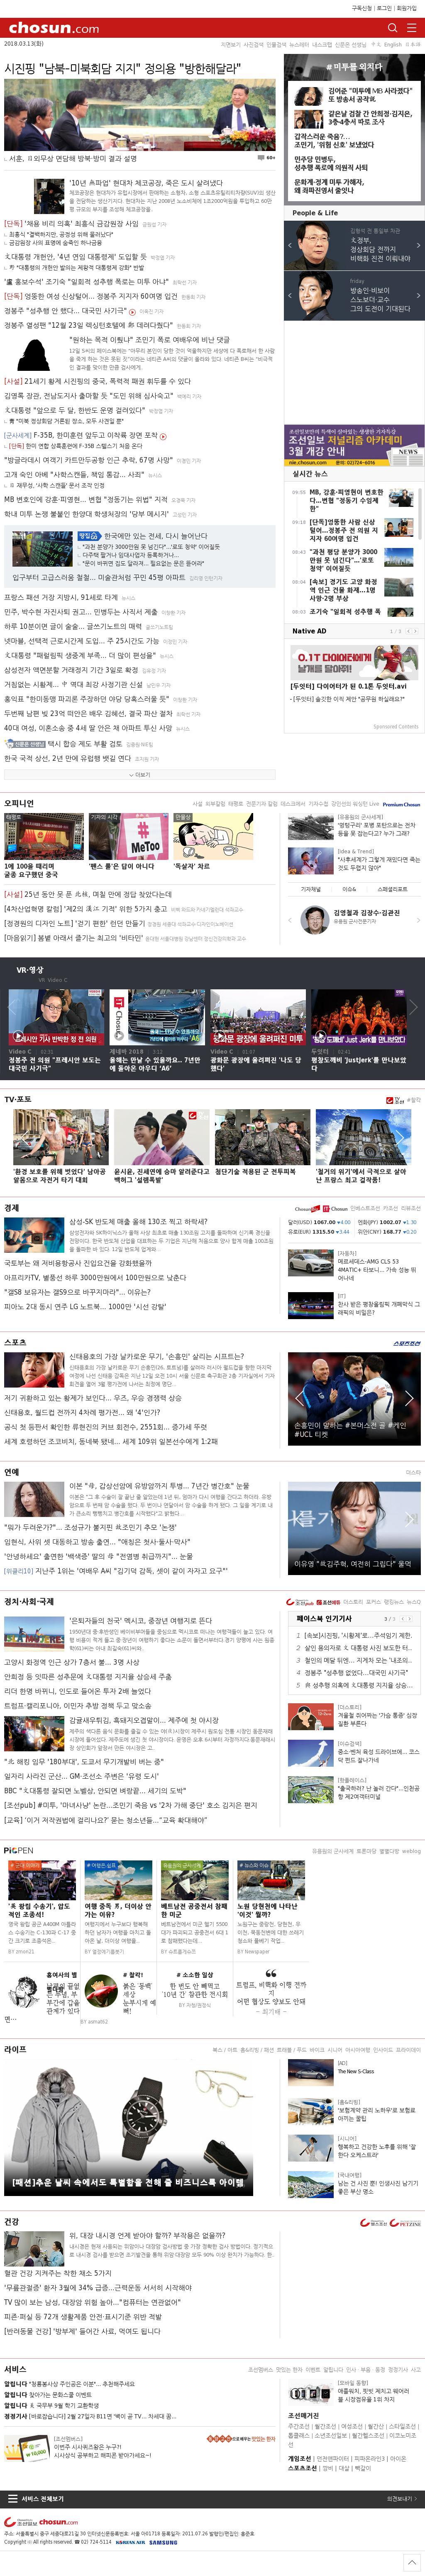 chosun.com at Monday March 12, 2018, 6:03 p.m. UTC